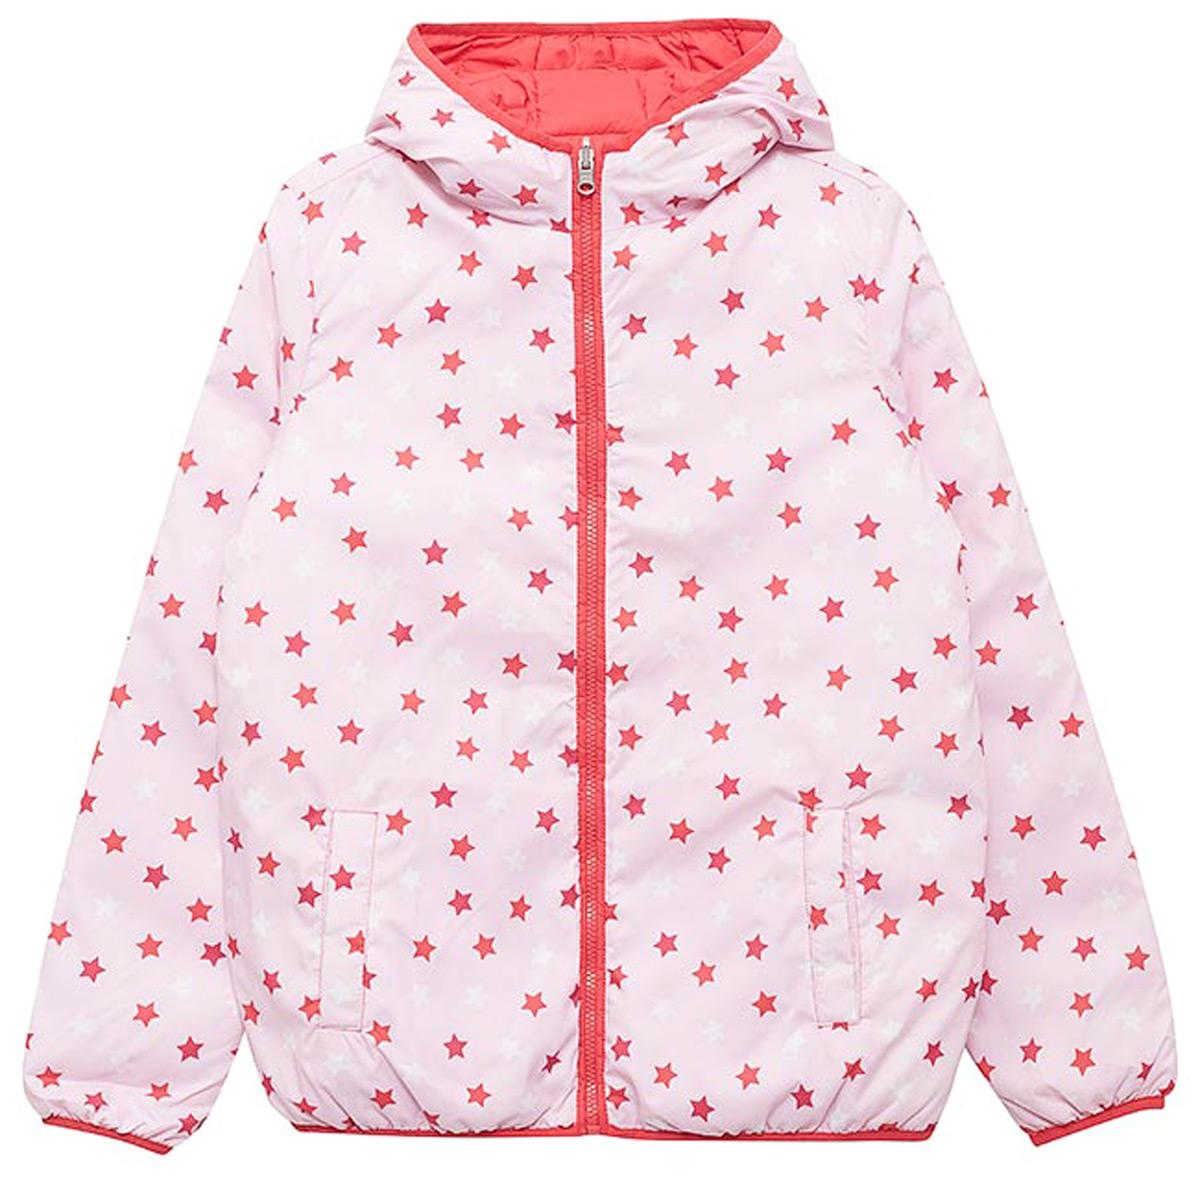 Куртка для девочек United Colors of Benetton, цвет: розовый. 2XD853BS0_903. Размер 150